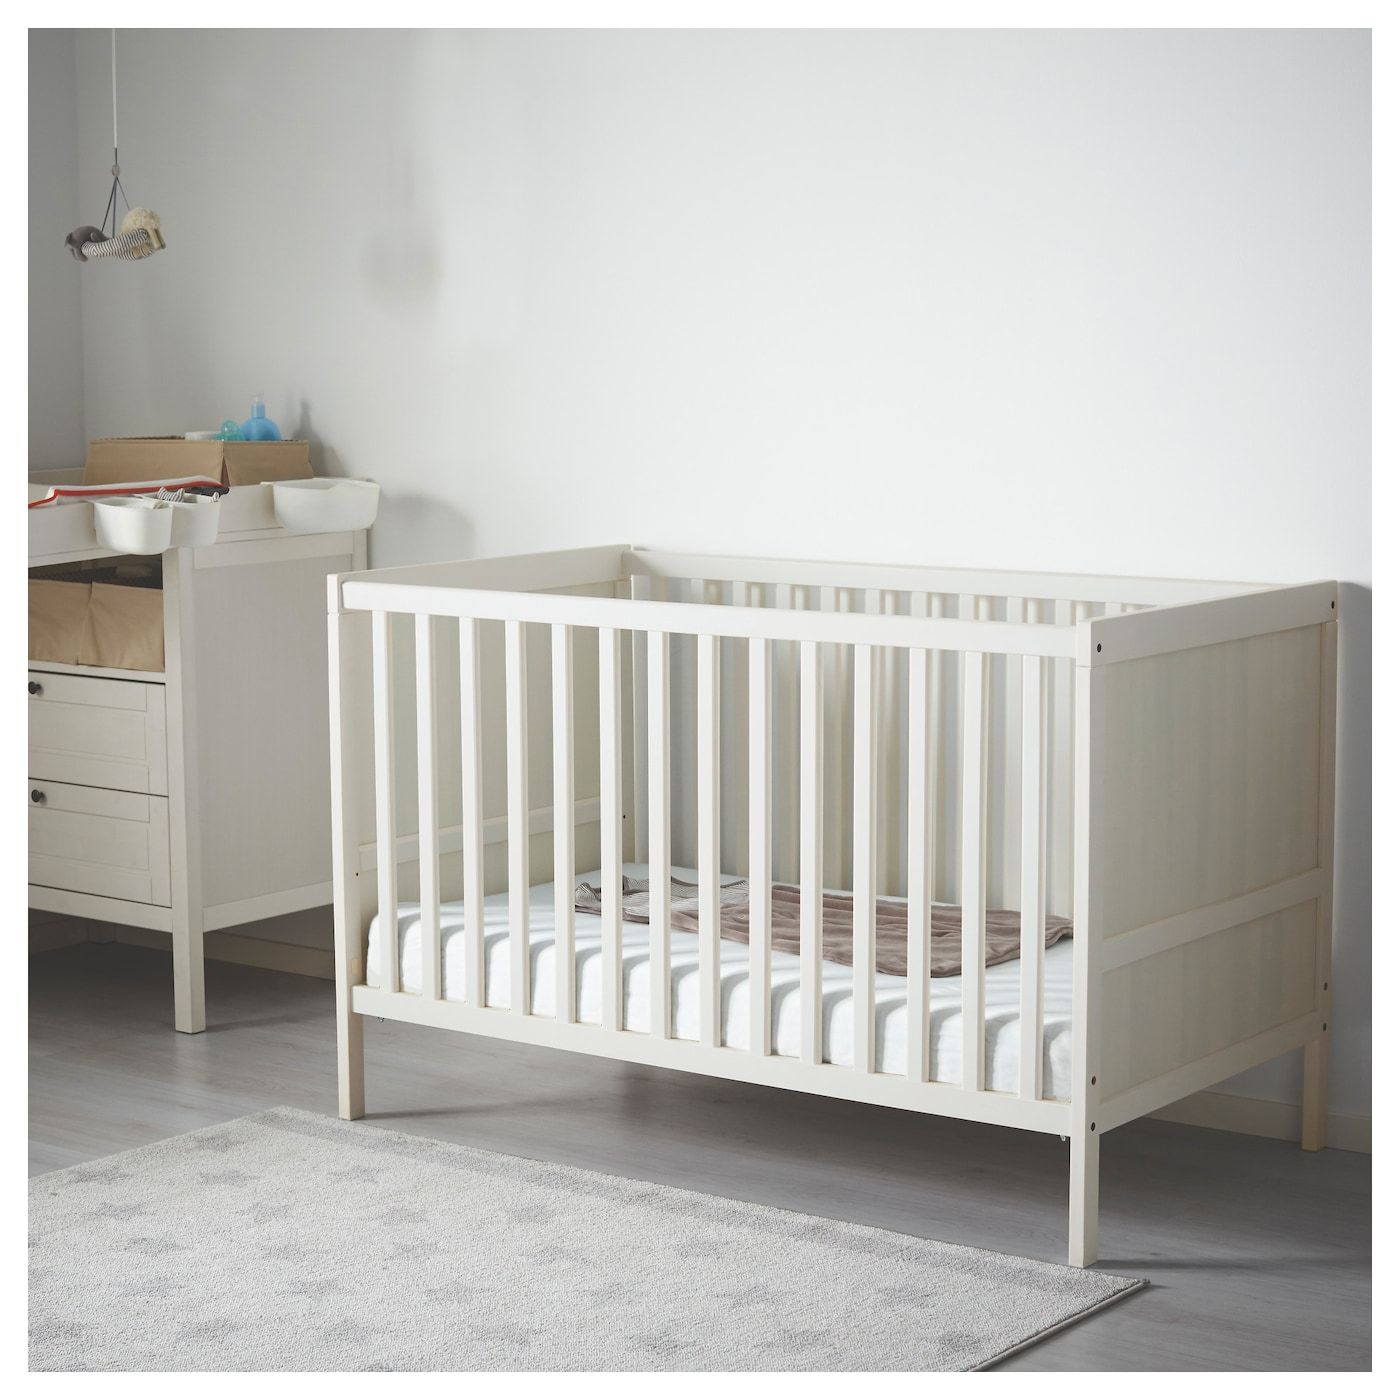 "SUNDVIK Crib, white, 27 1/2x52"" IKEA Ikea crib, Ikea"